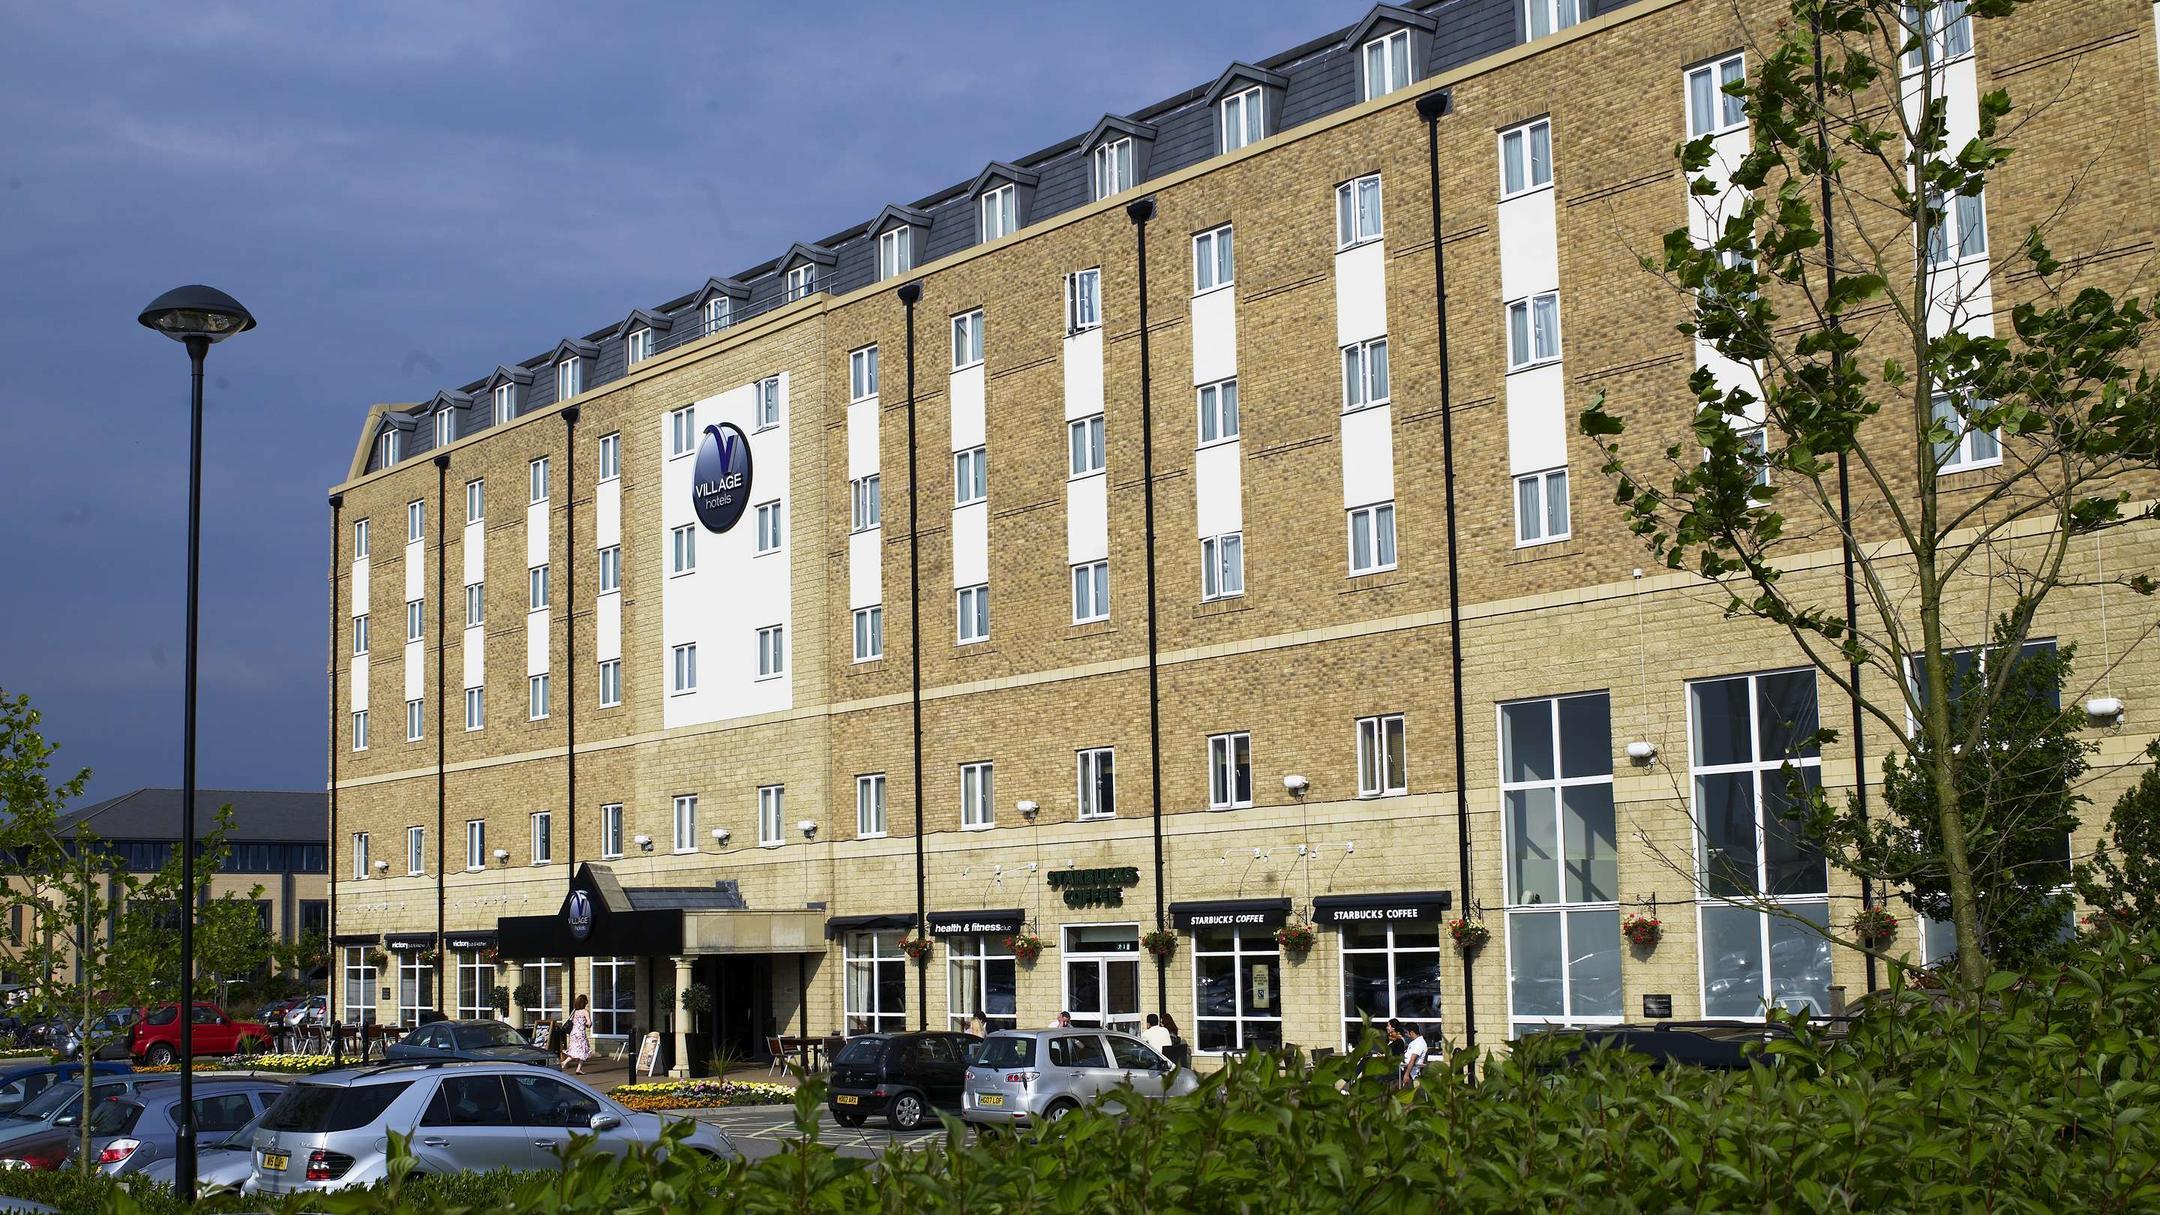 Village Hotel Bournemouth em Bournemouth, ENG, Reino Unido